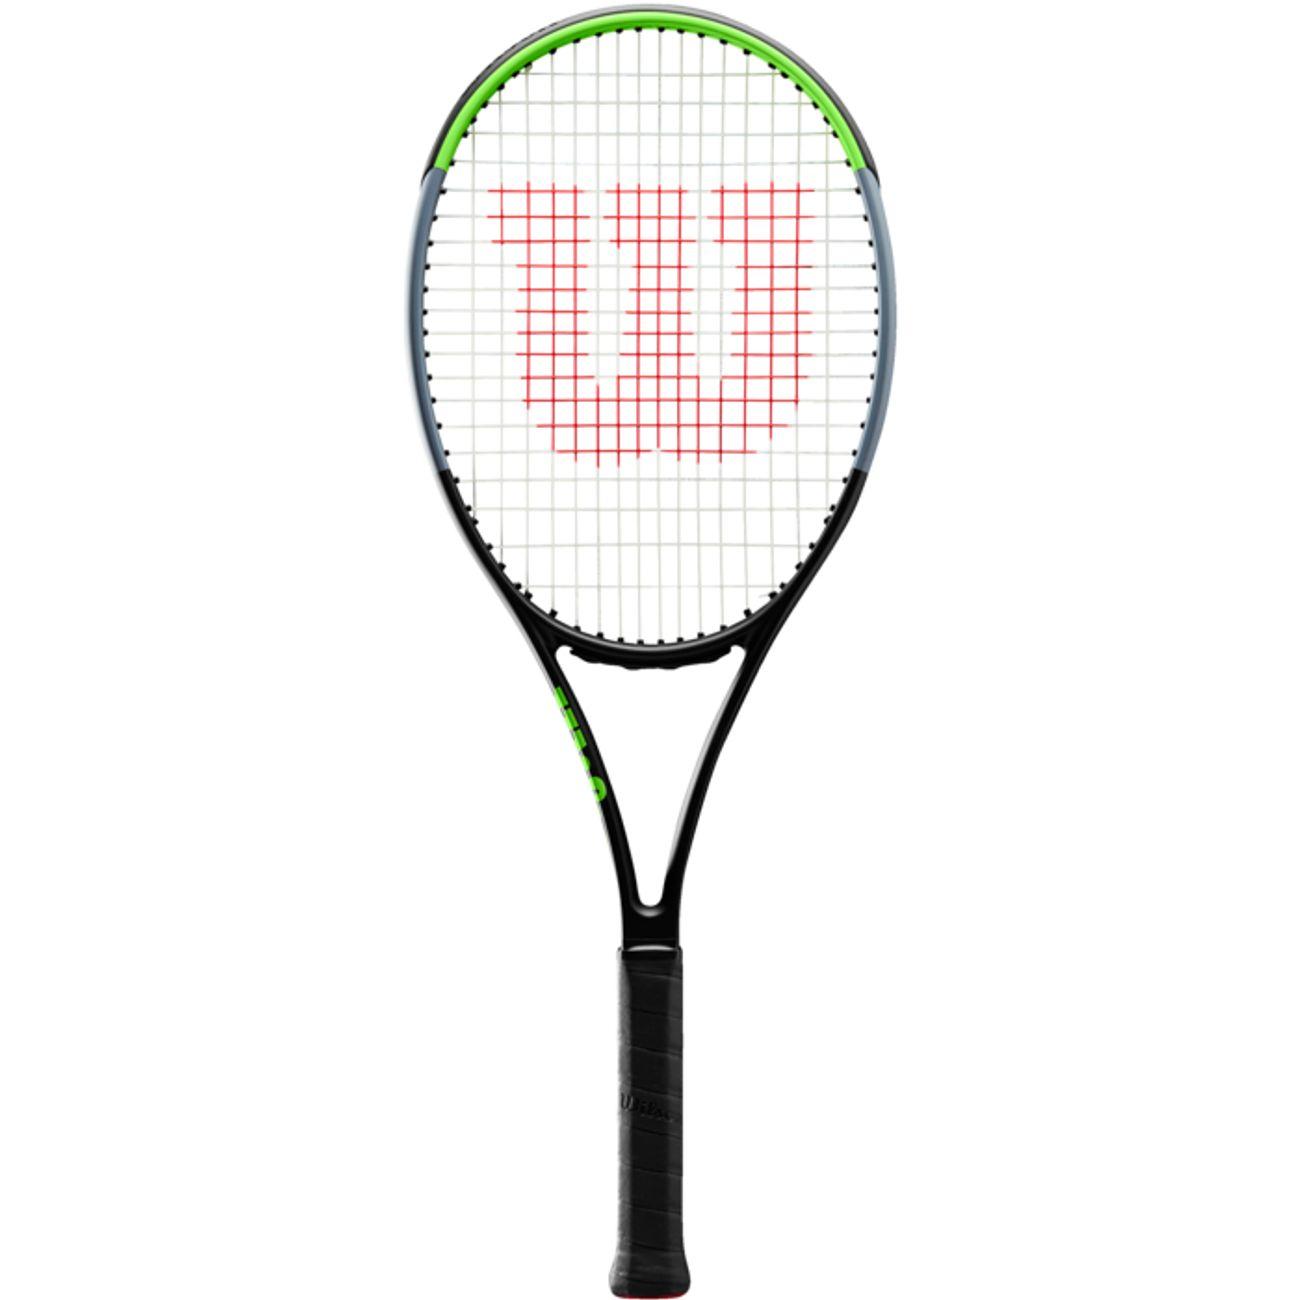 RAQUETTE Tennis  WILSON BLADE 101L